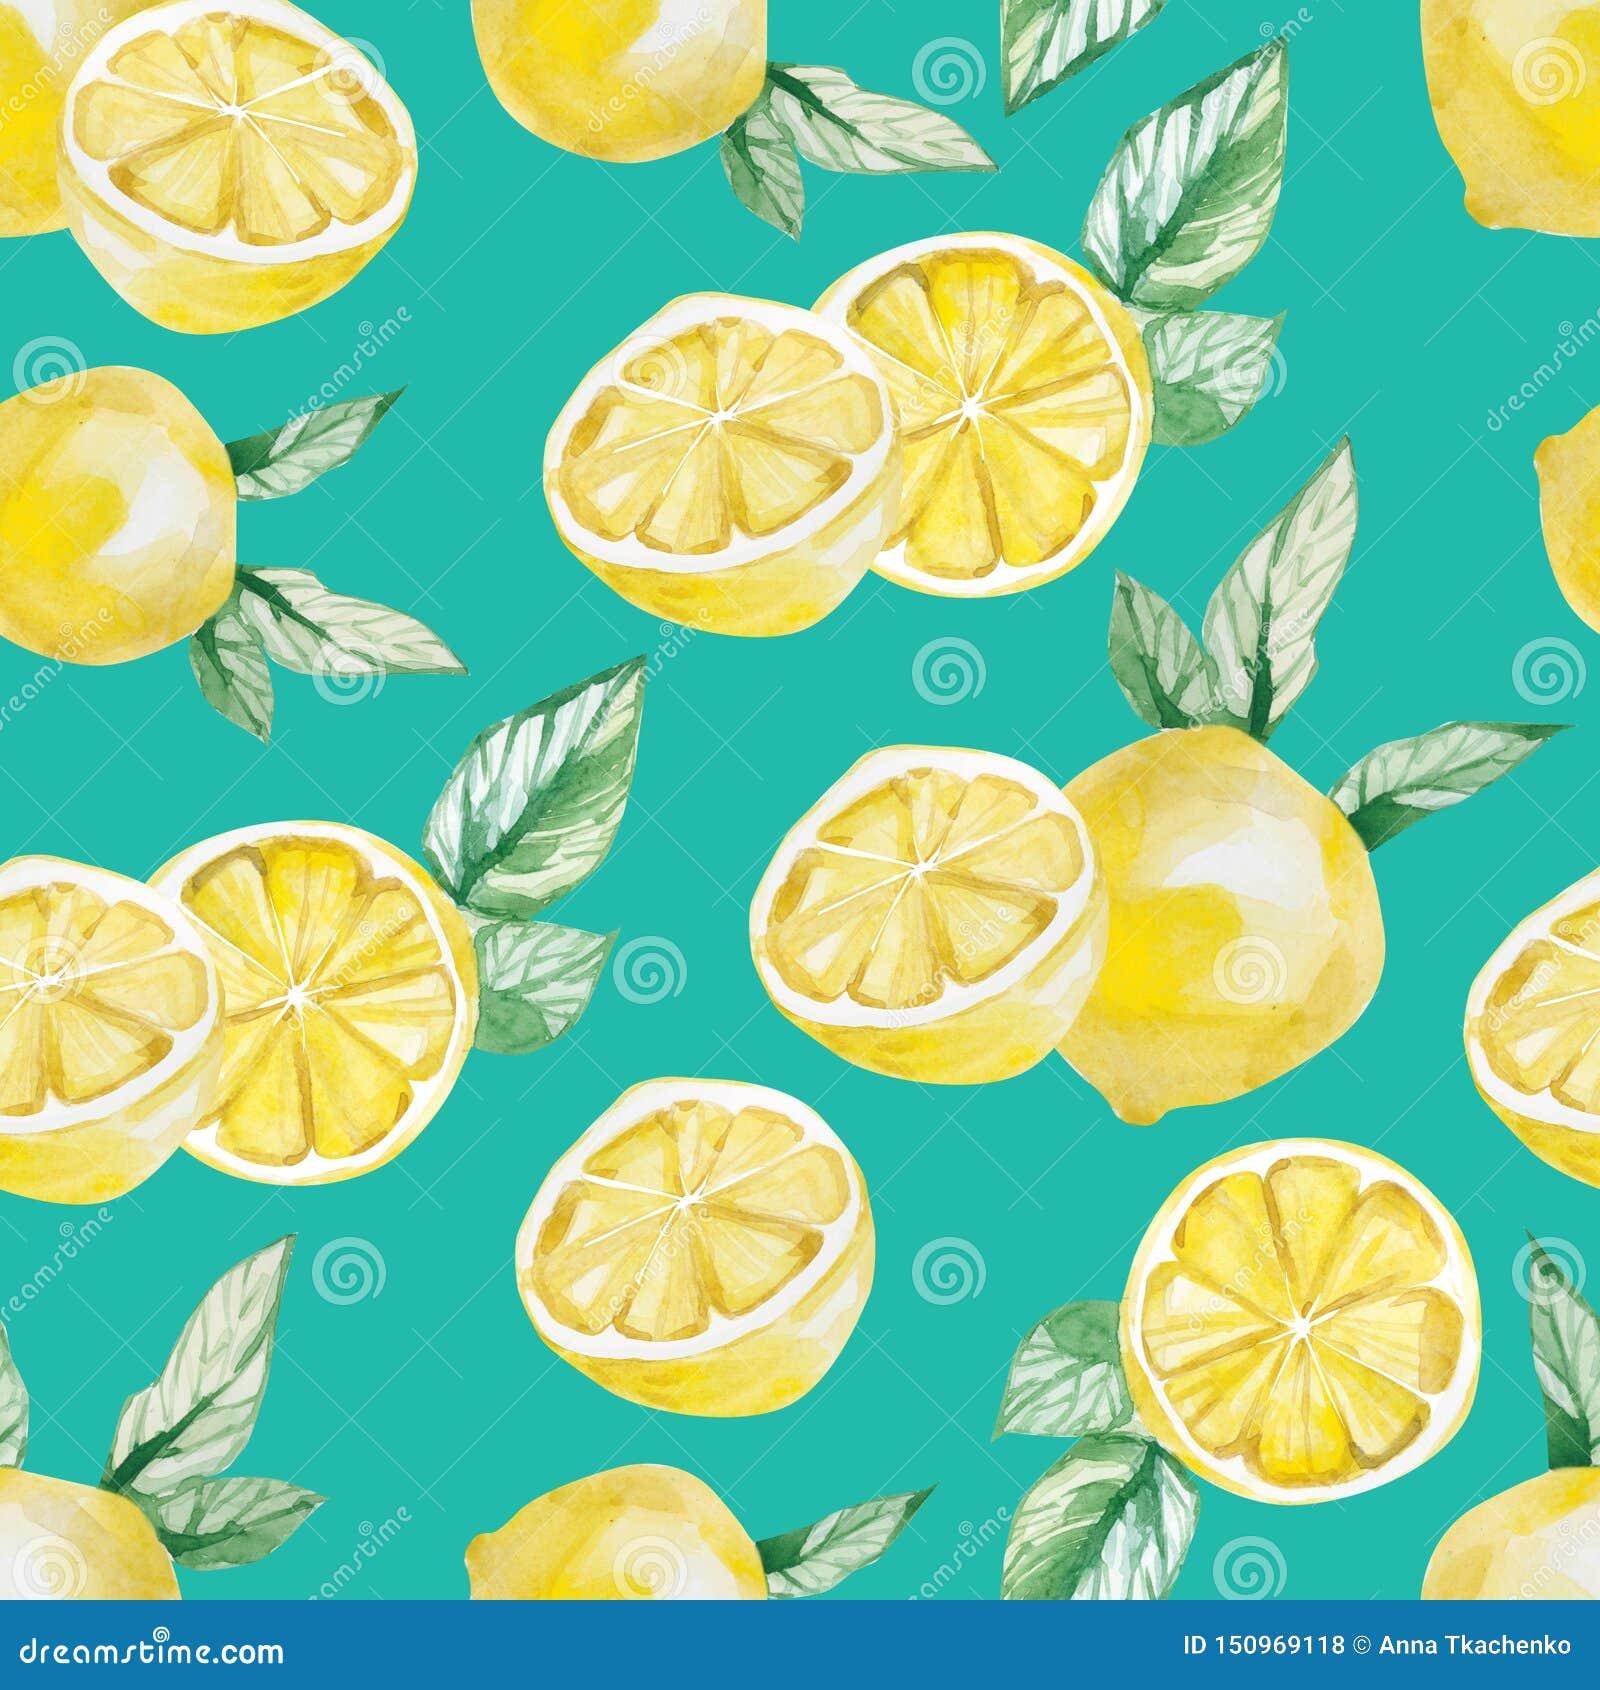 Watercolor Tropical Fruit Pattern Lemon Print For The Textile